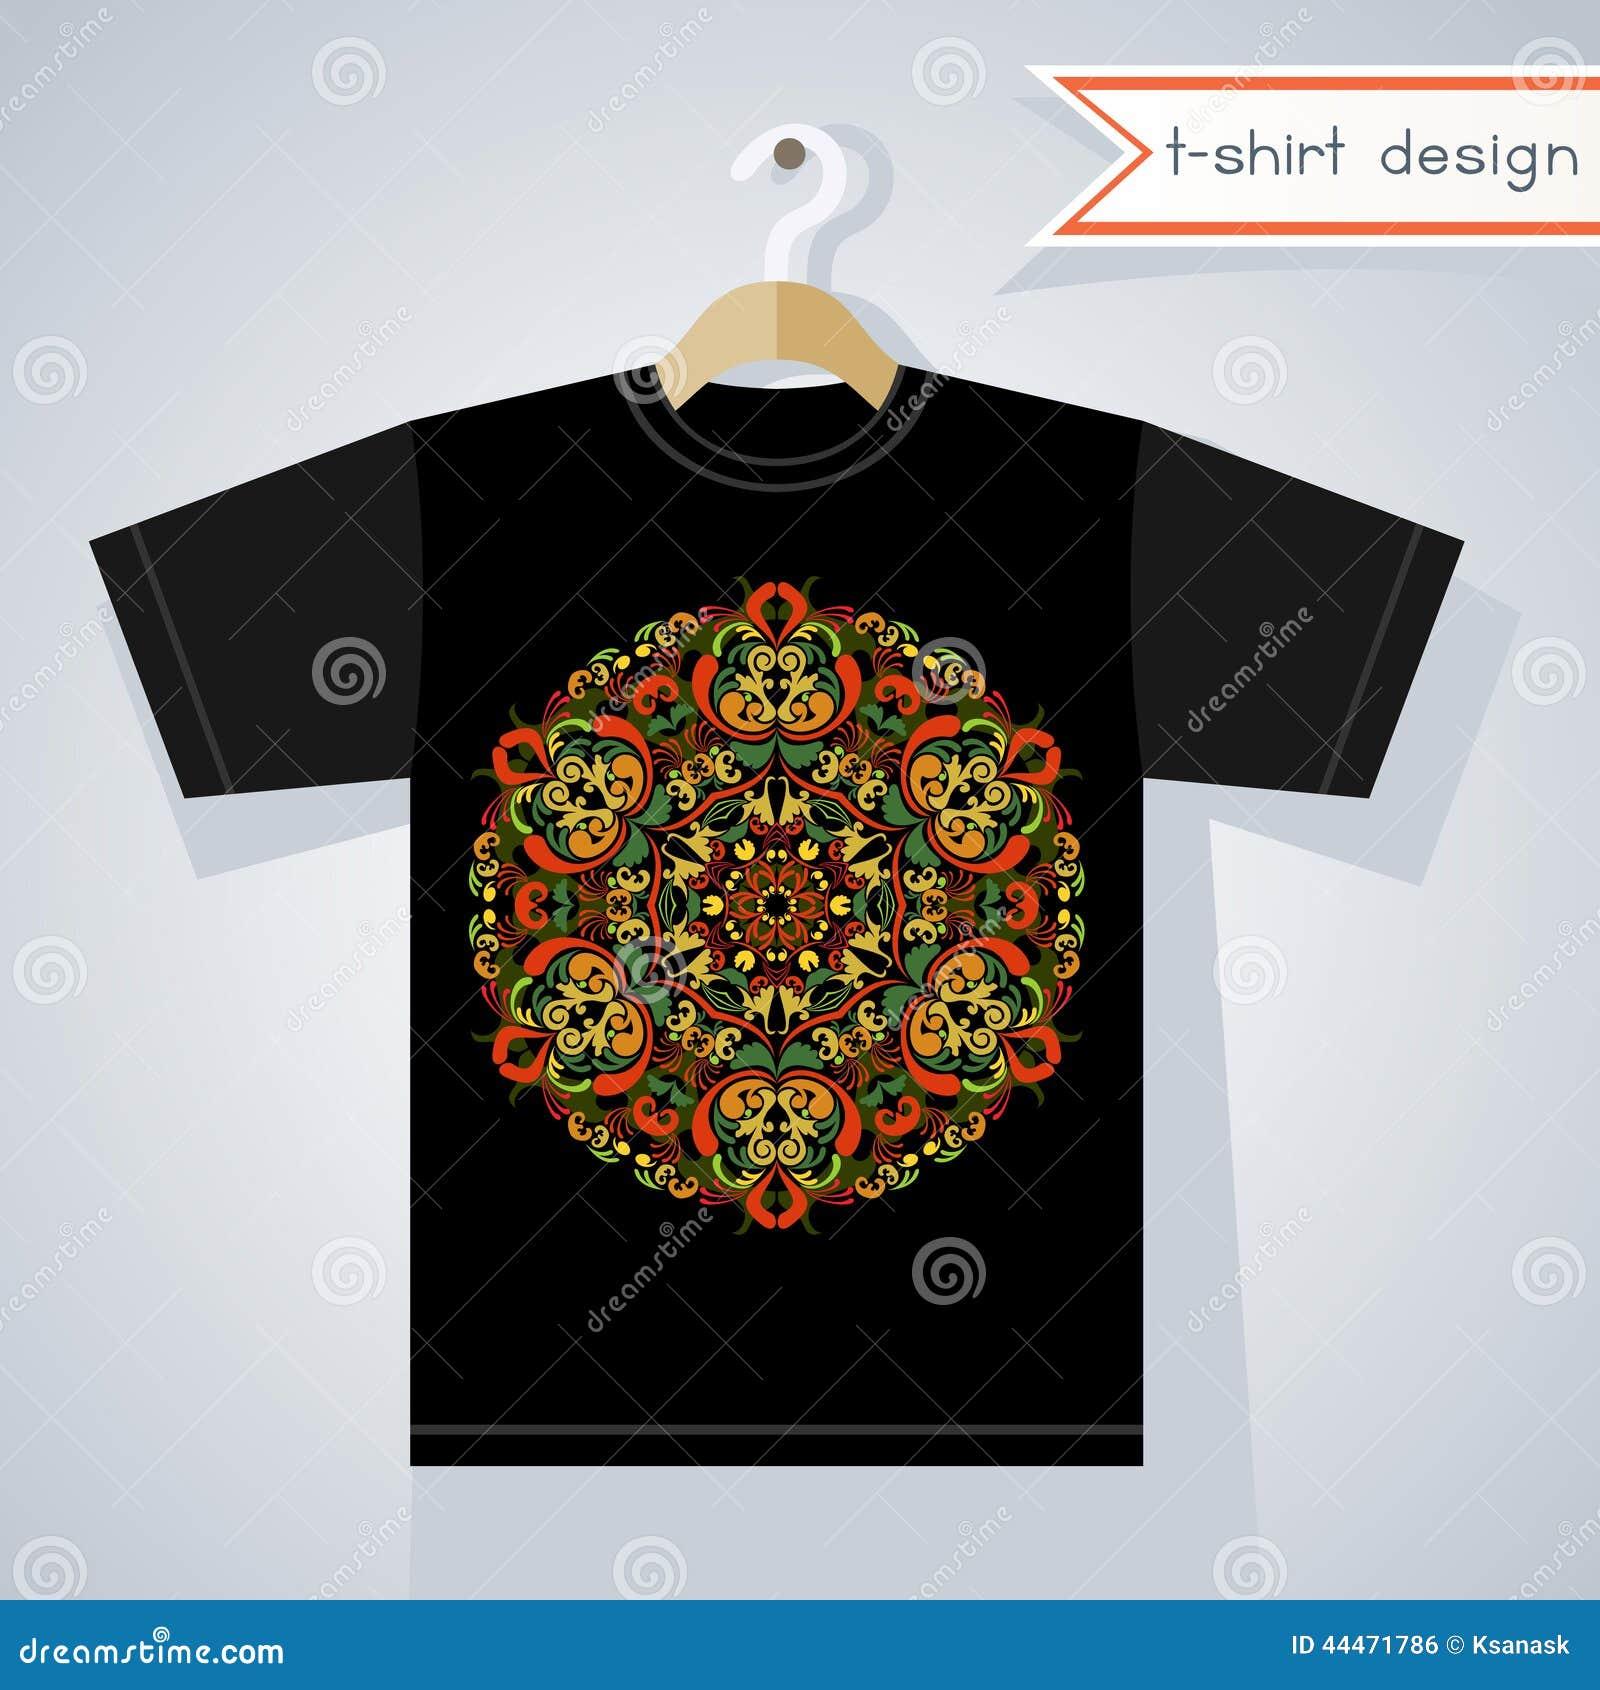 Black t shirt designs - Abstract Black Bright Clothing Design